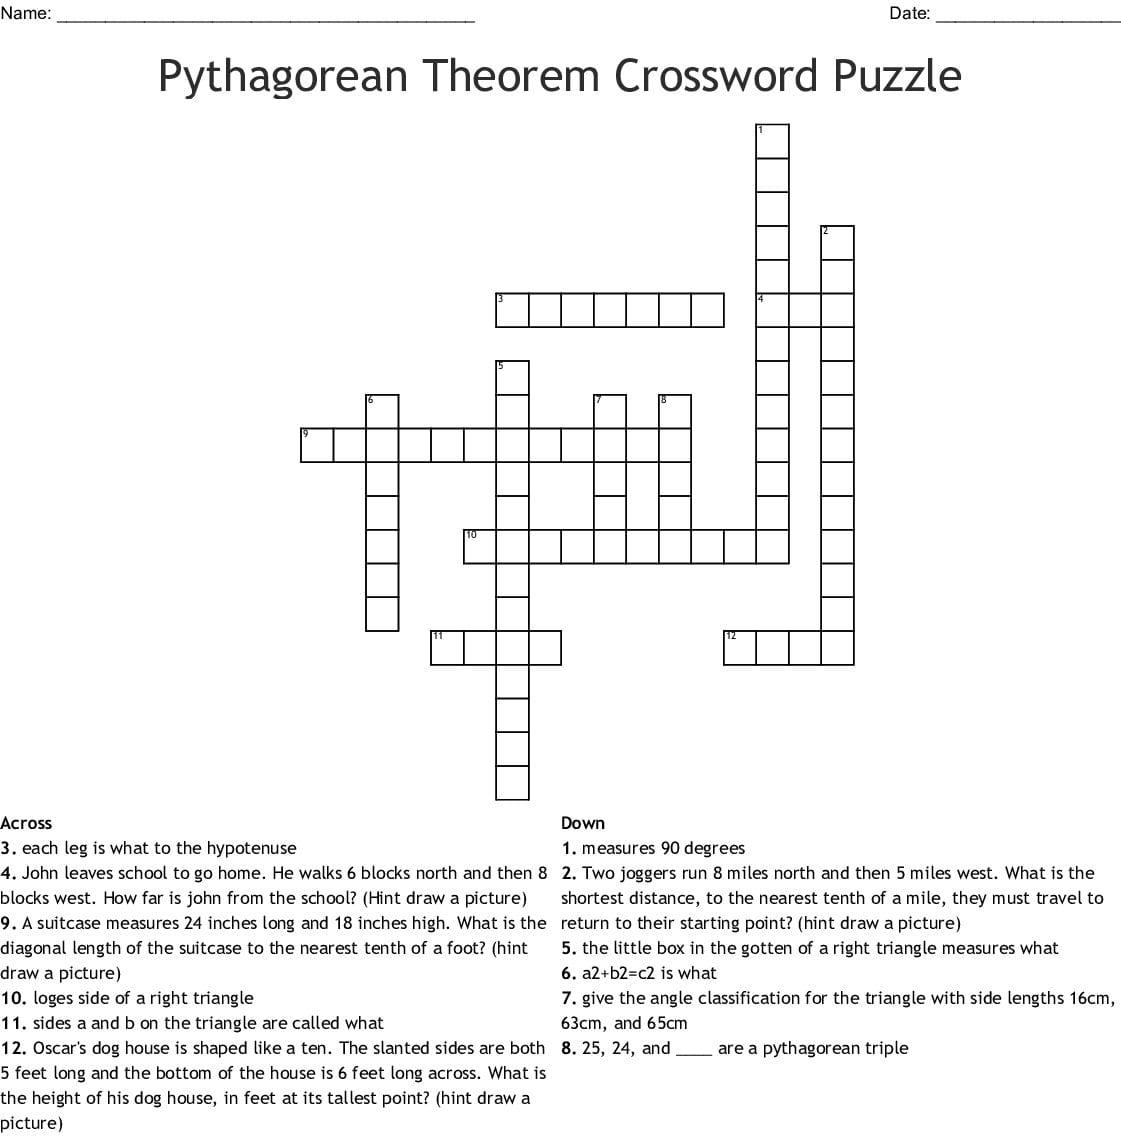 Pythagorean Theorem Crossword Puzzle Word